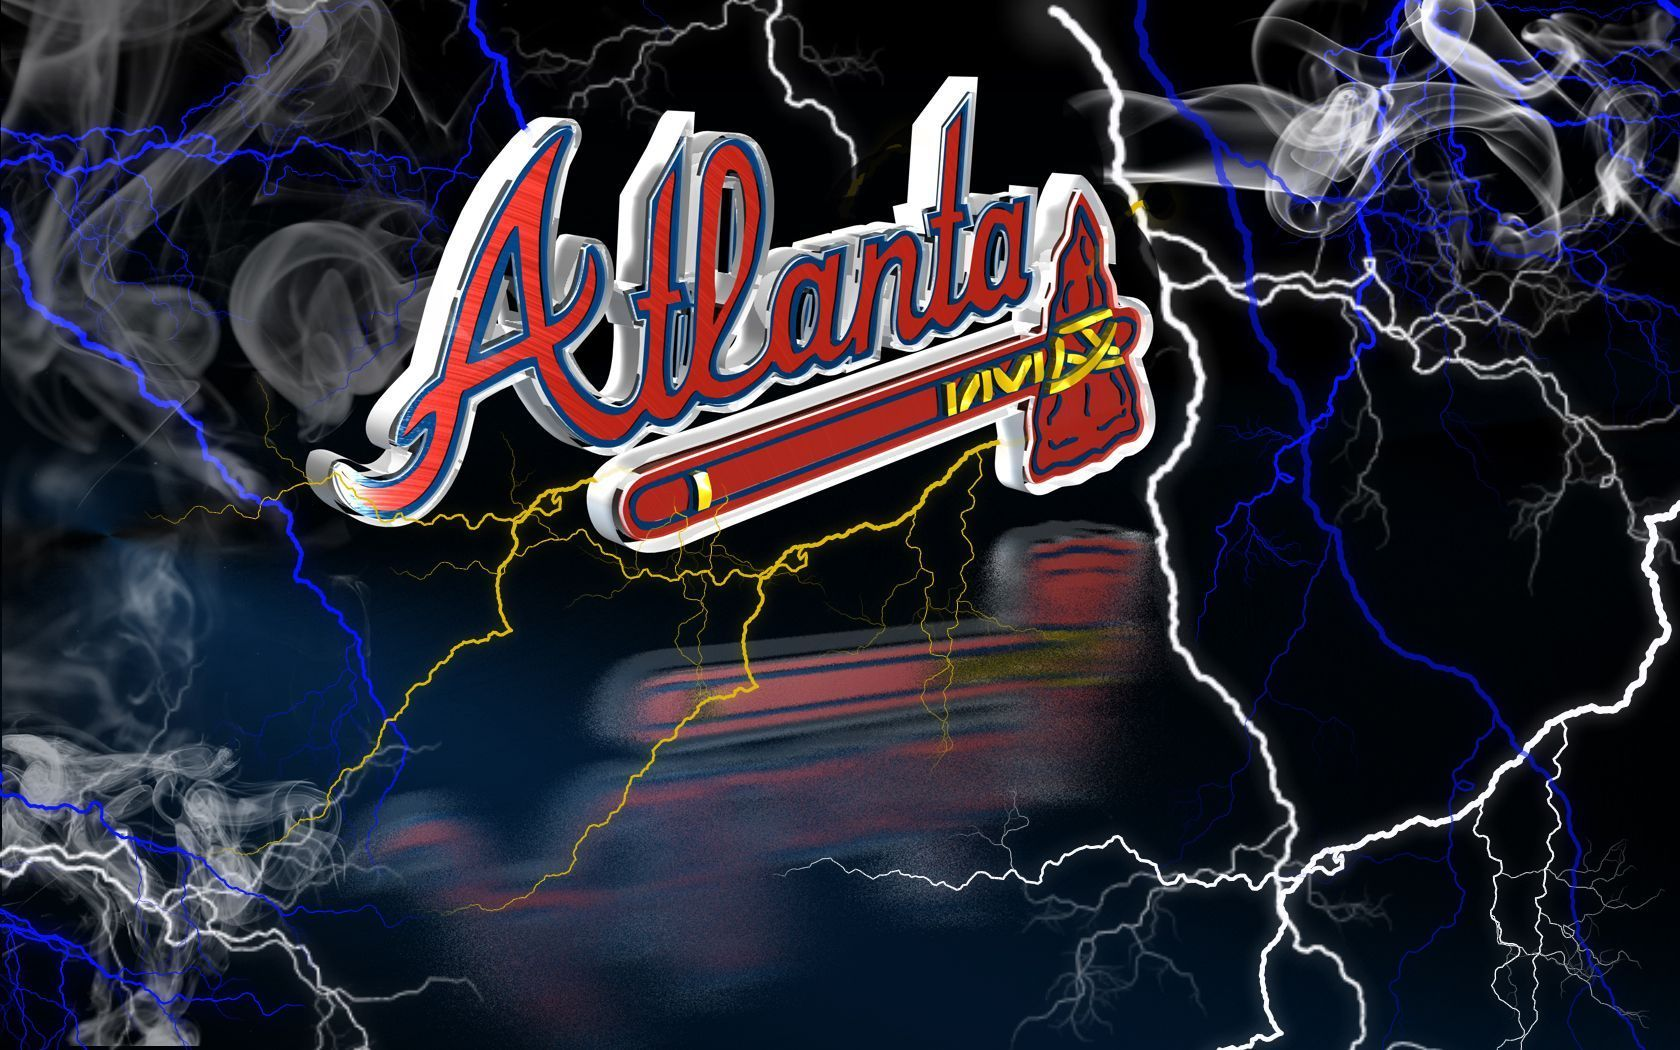 Cristiano Ronaldo Wallpaper Hd Backgrounds 506 Seo Wallpaper Wallpaper Zone Atlanta Braves Wallpaper Atlanta Braves Braves Tickets